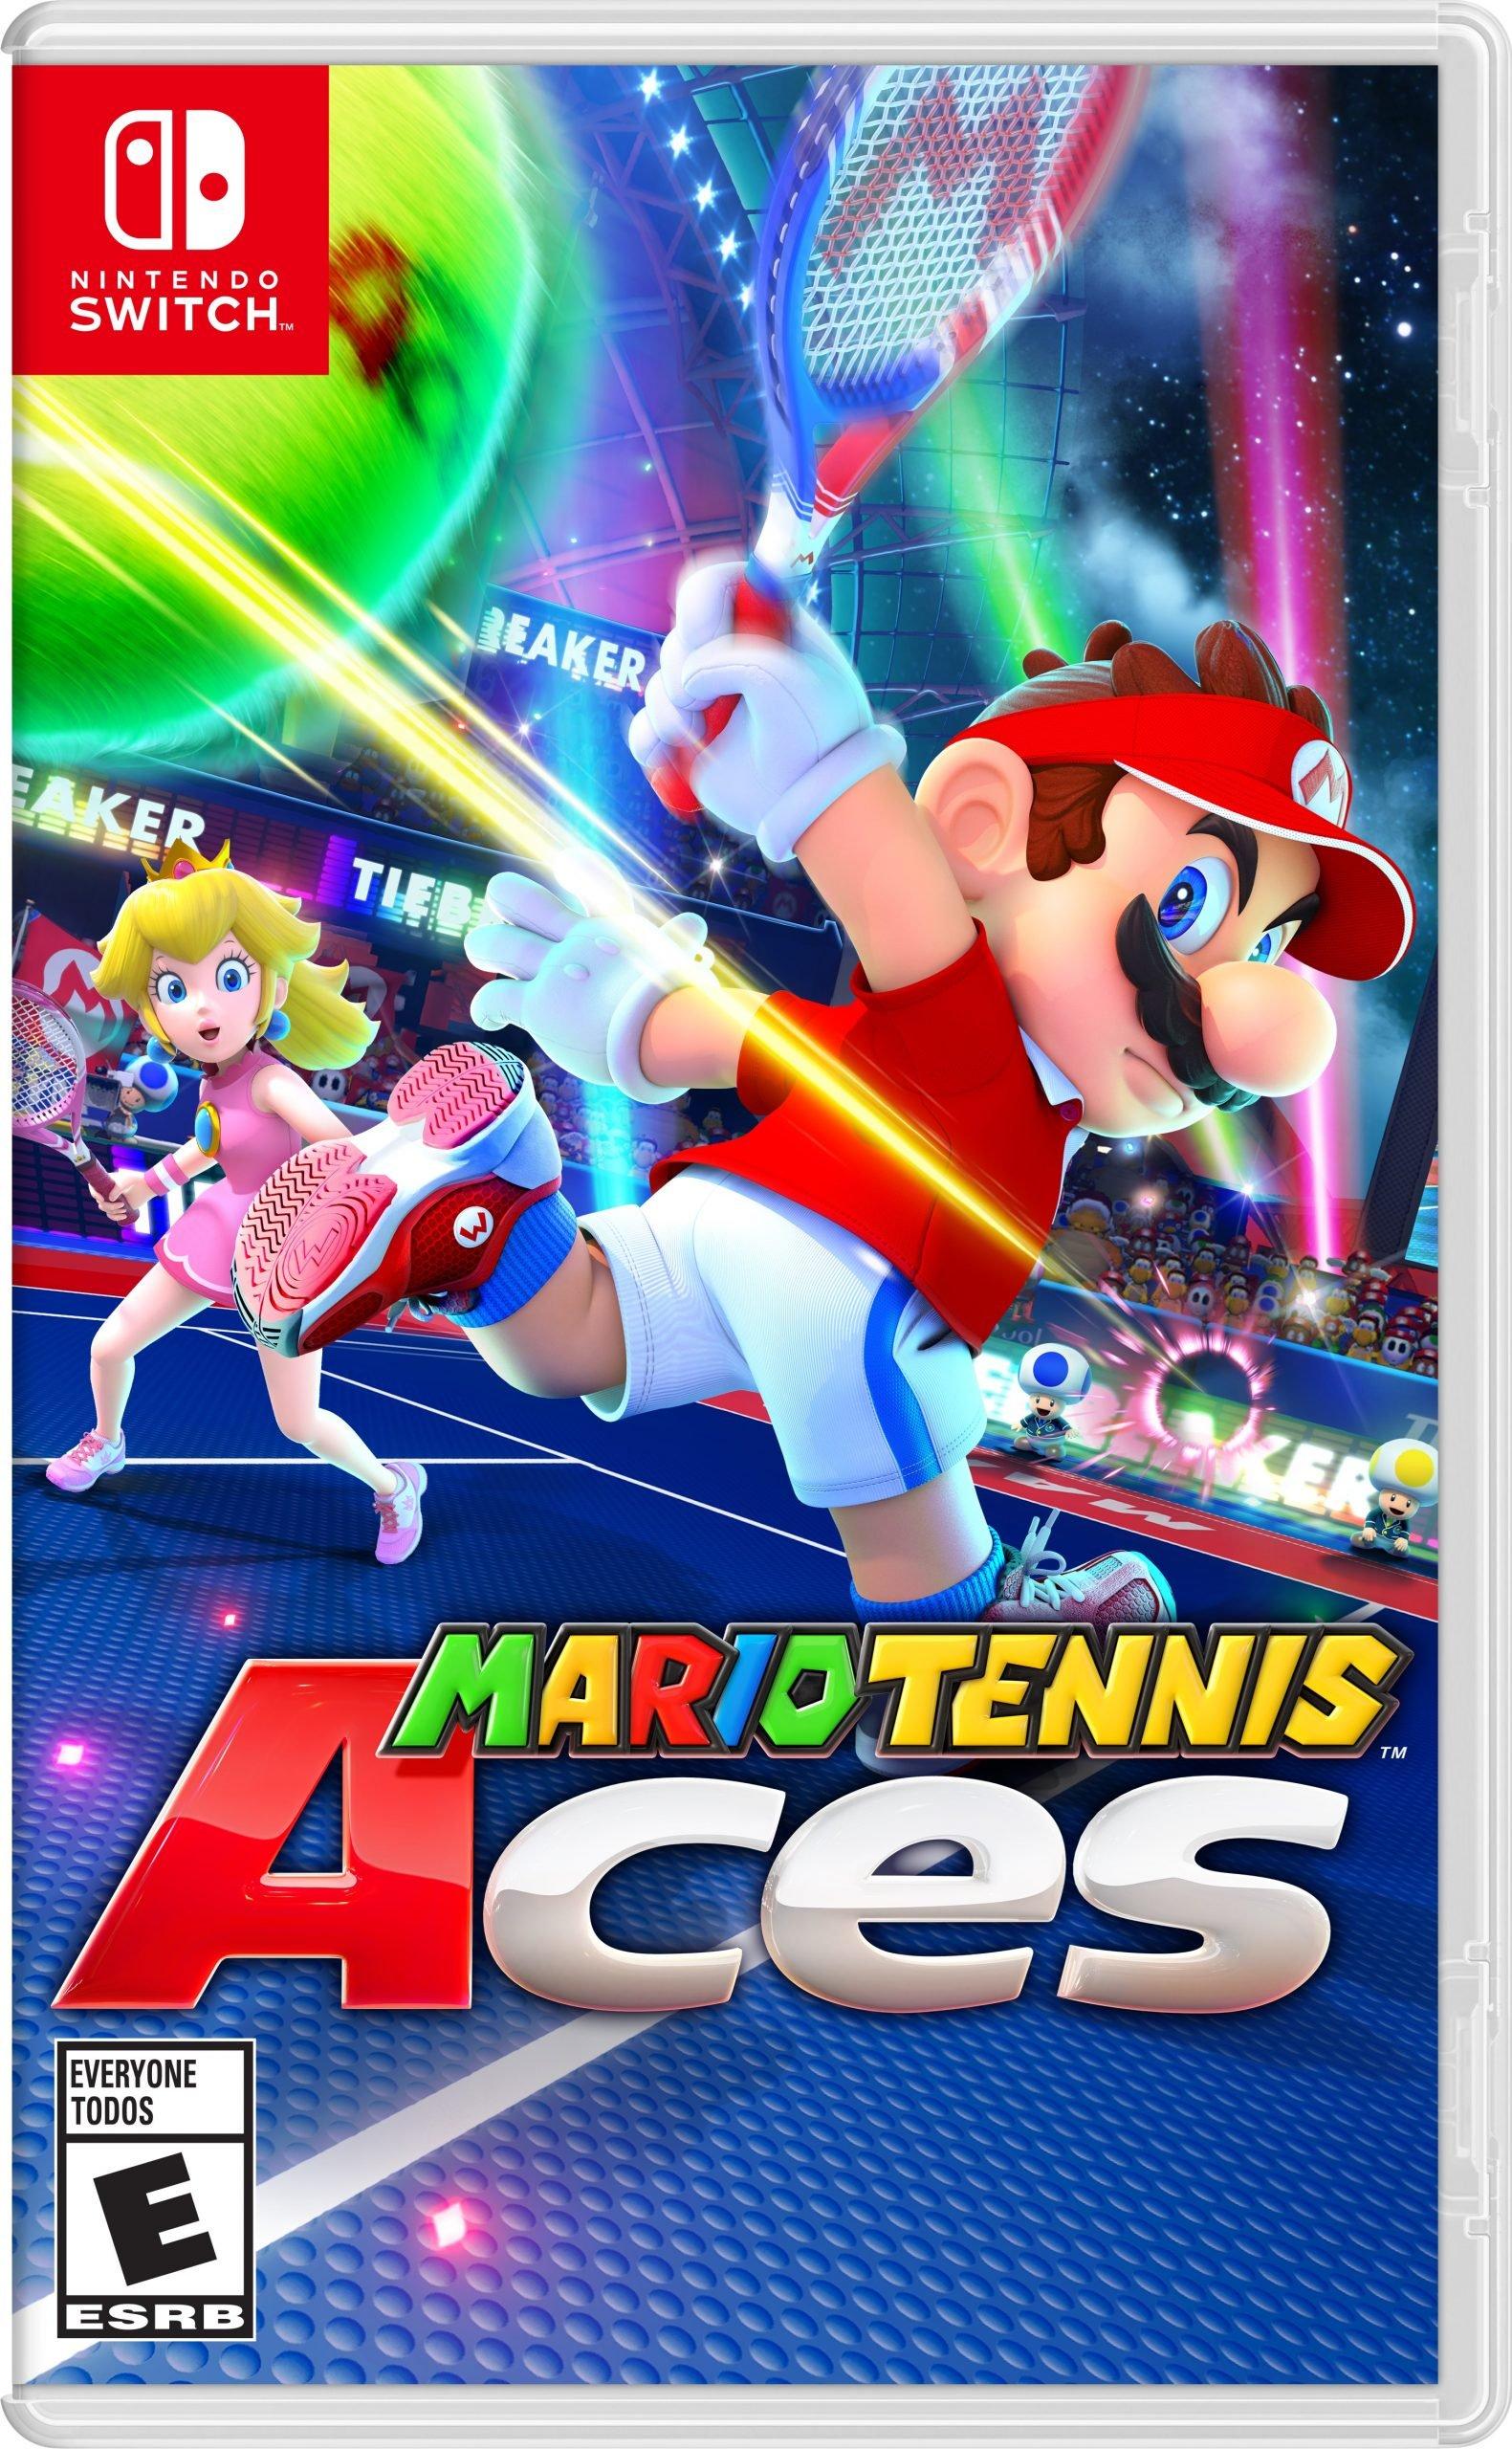 Mario Tennis Aces (Nintendo Switch) Review 5